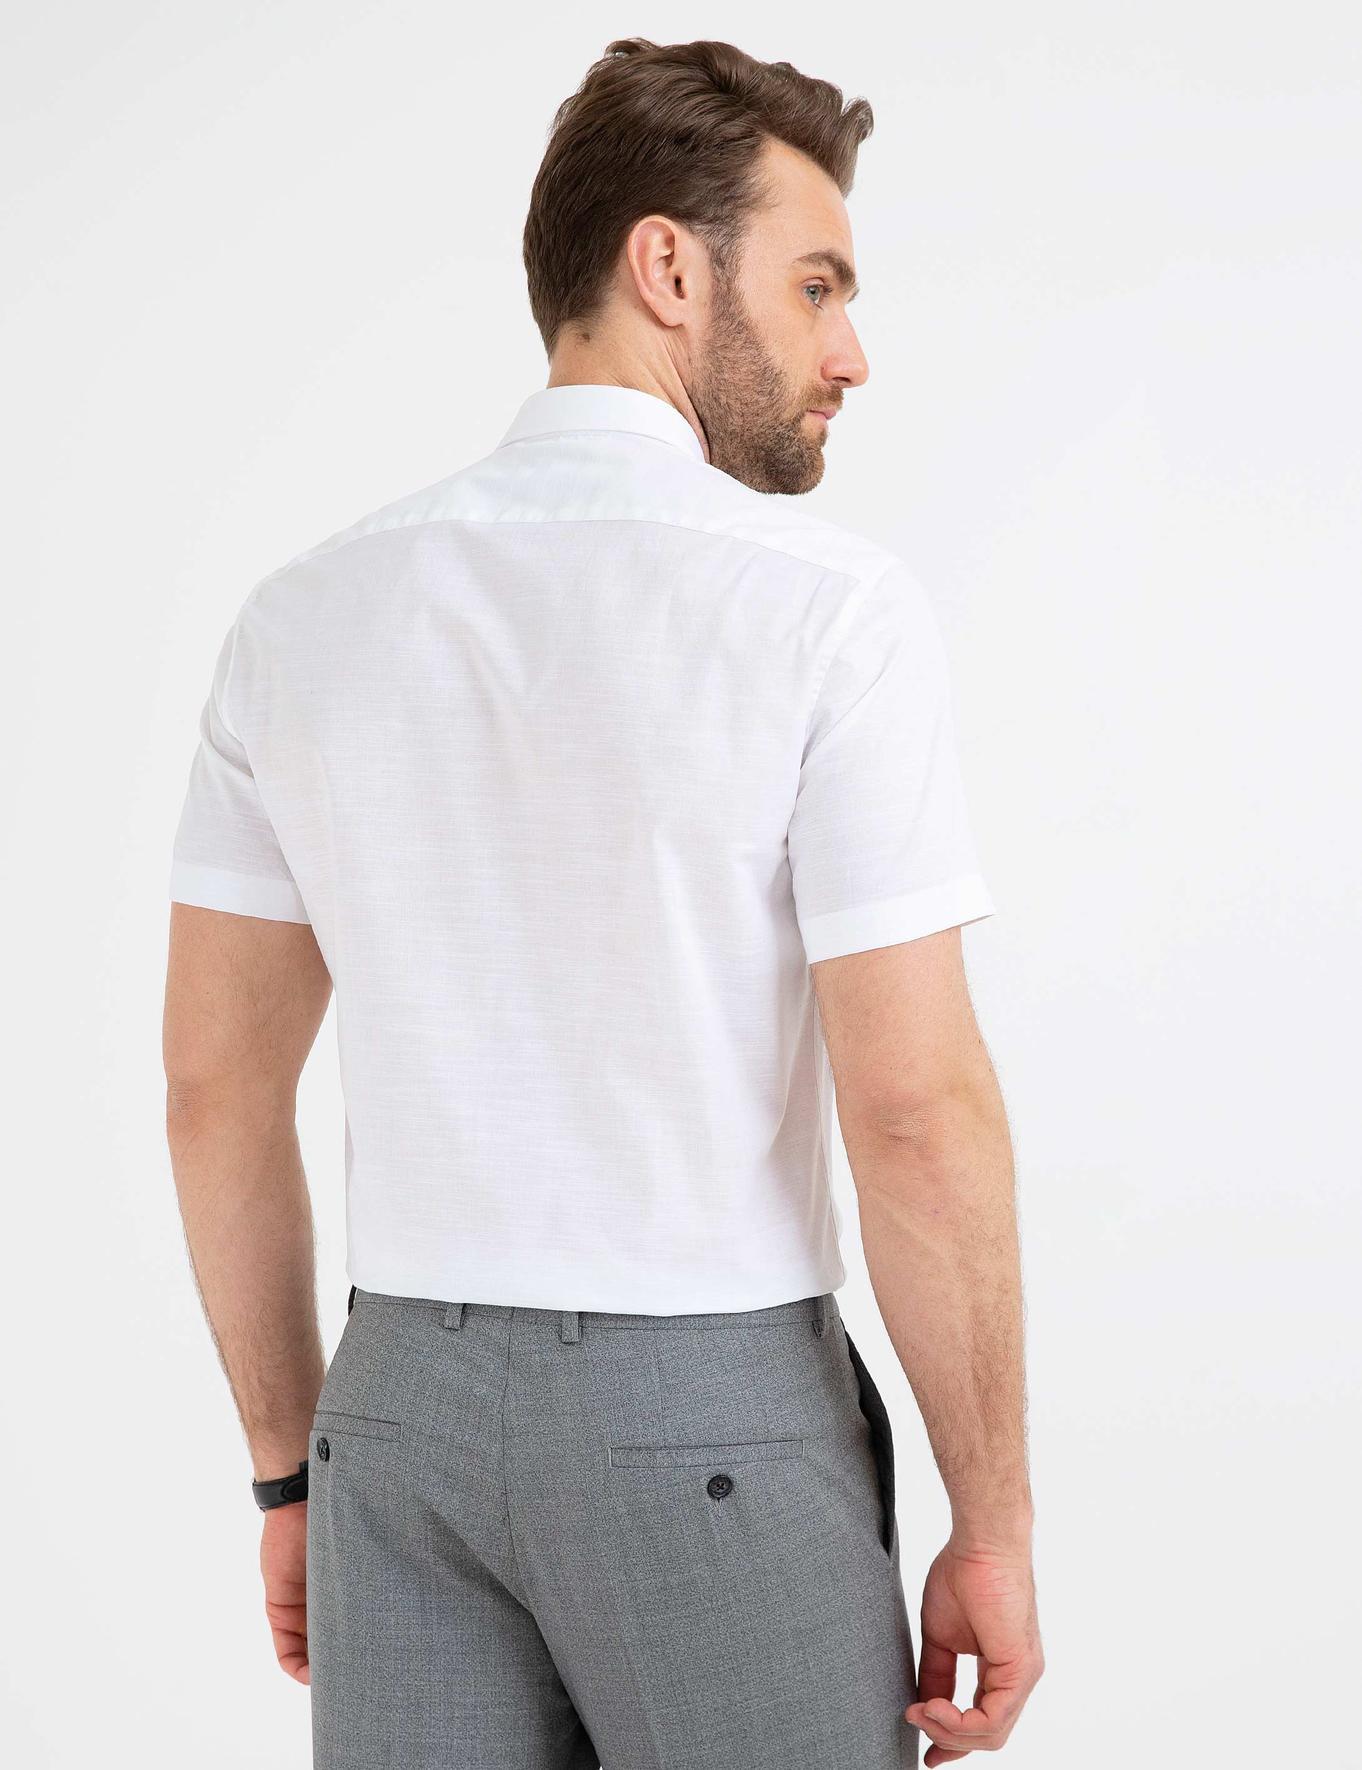 Regular Beyaz Gömlek